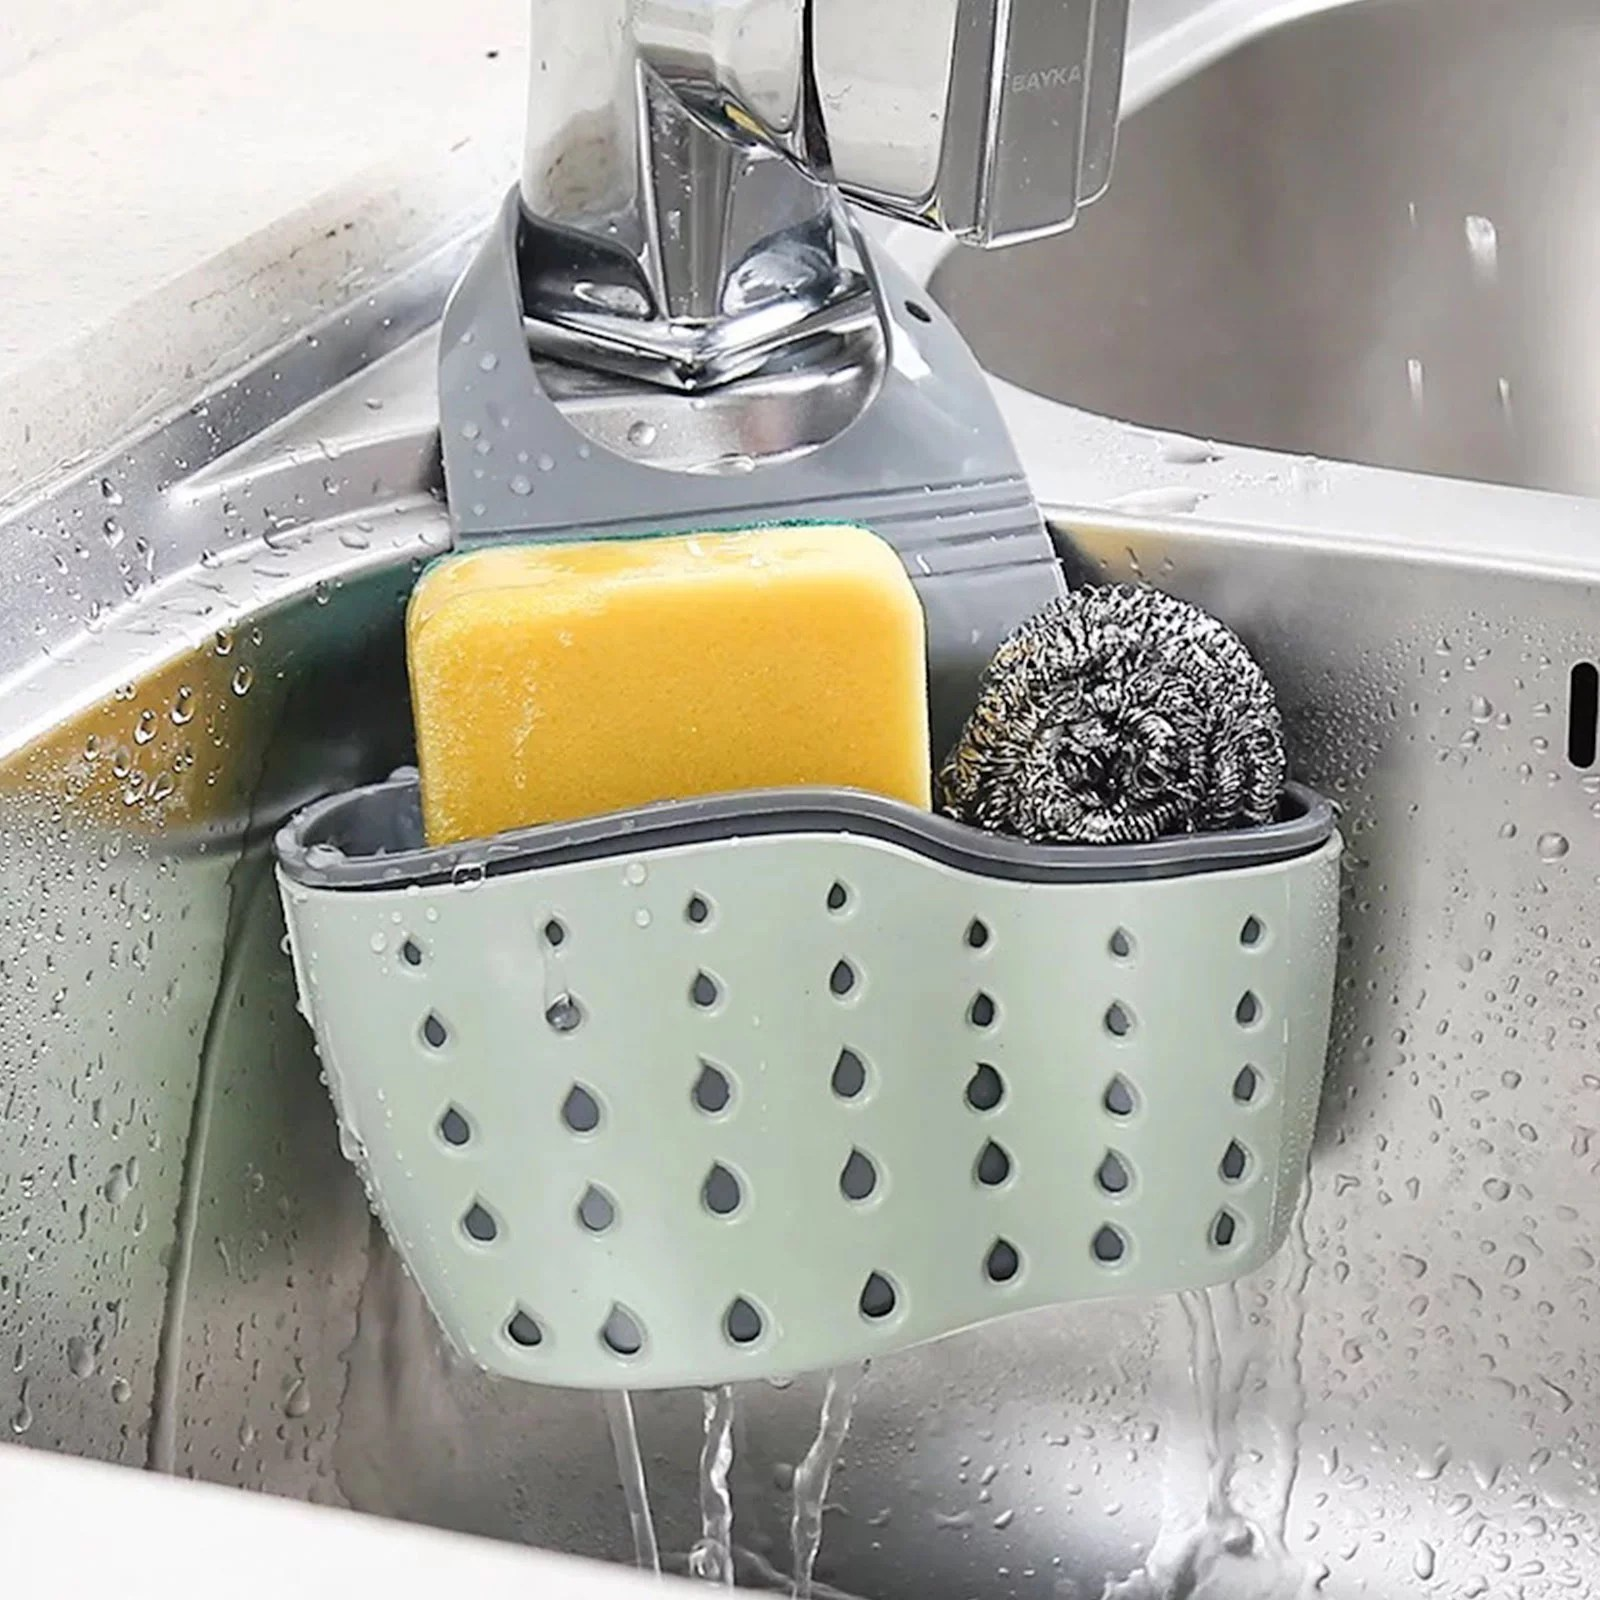 eeekit kitchen hanging sponge holder adjustable rubber sink caddy organizer dishwashing liquid drainer brush rack draining basket for scrubber dish